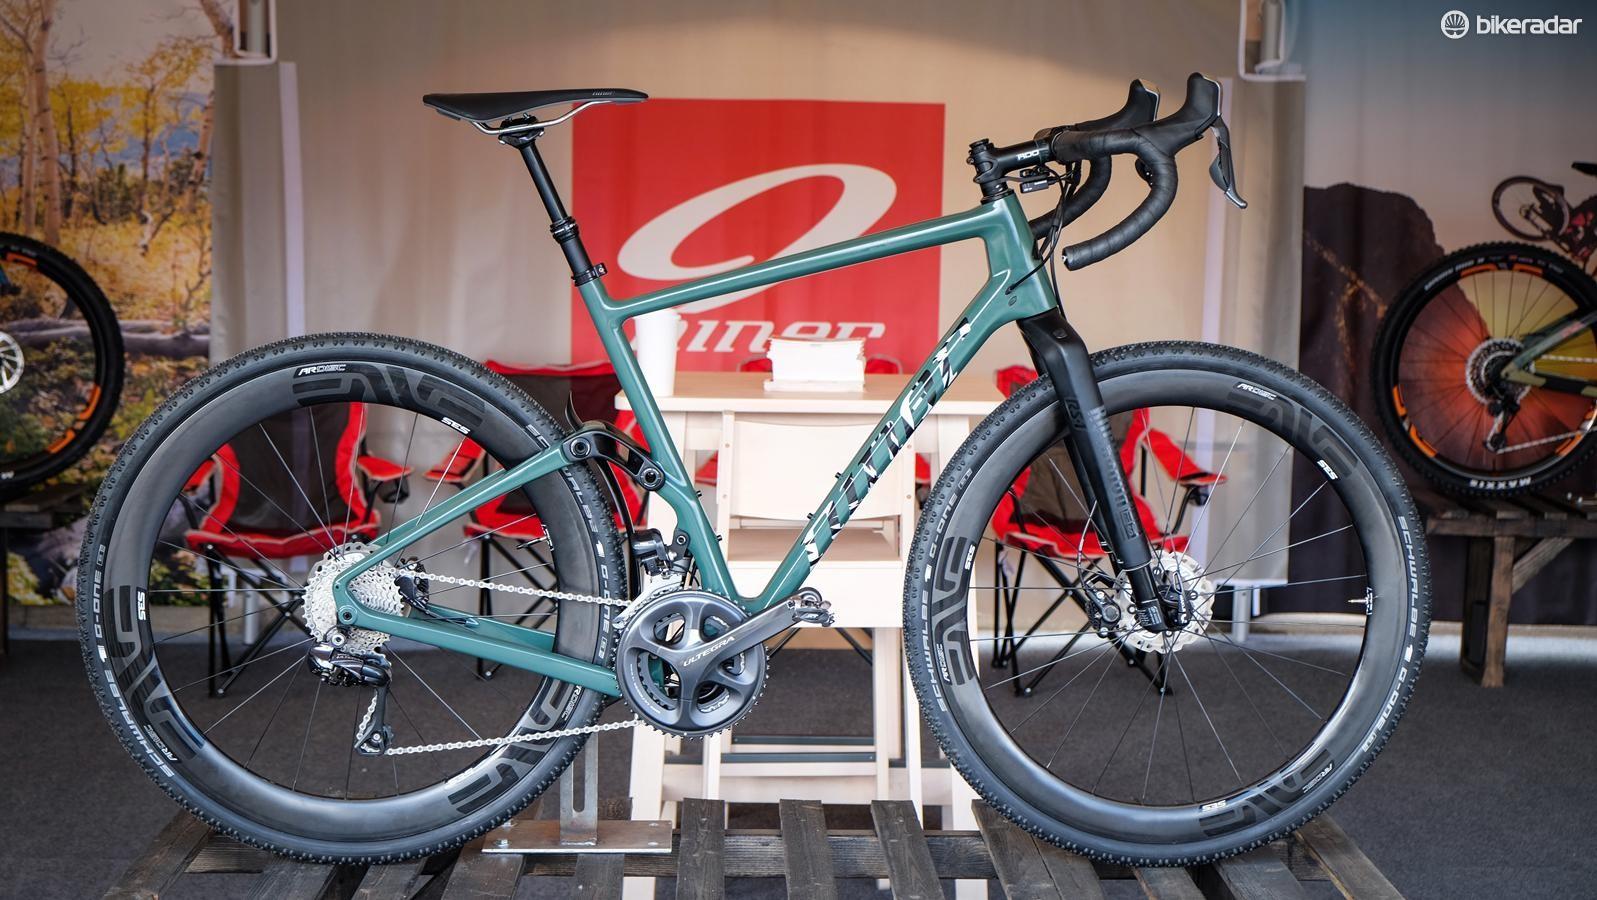 Coming next year: Niner's MCR 9 RDO full suspension gravel bike